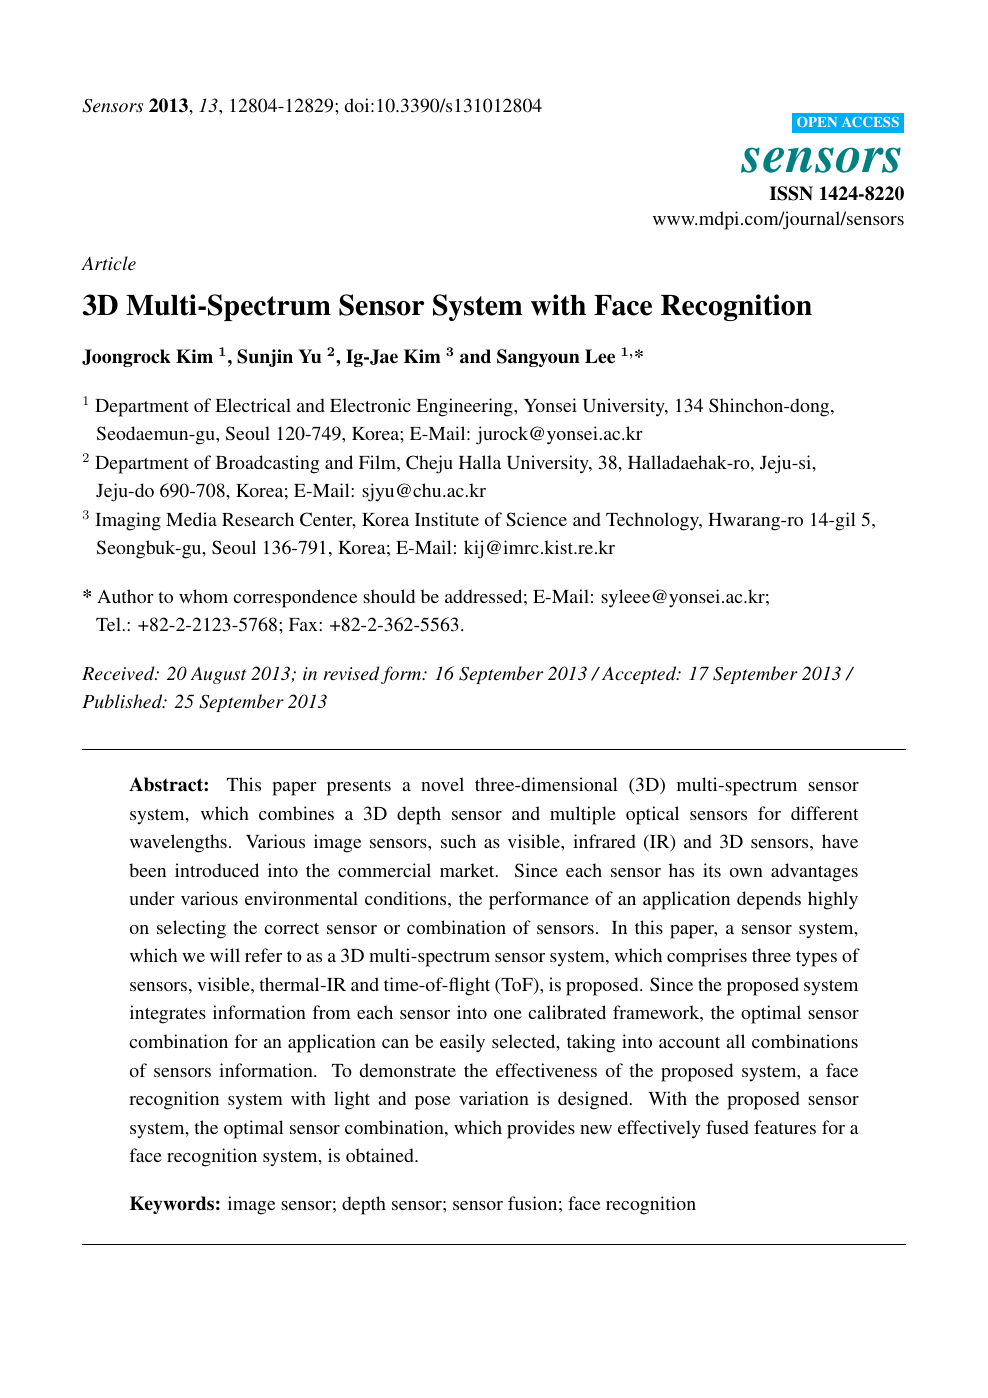 3D Multi-Spectrum Sensor System with Face Recognition